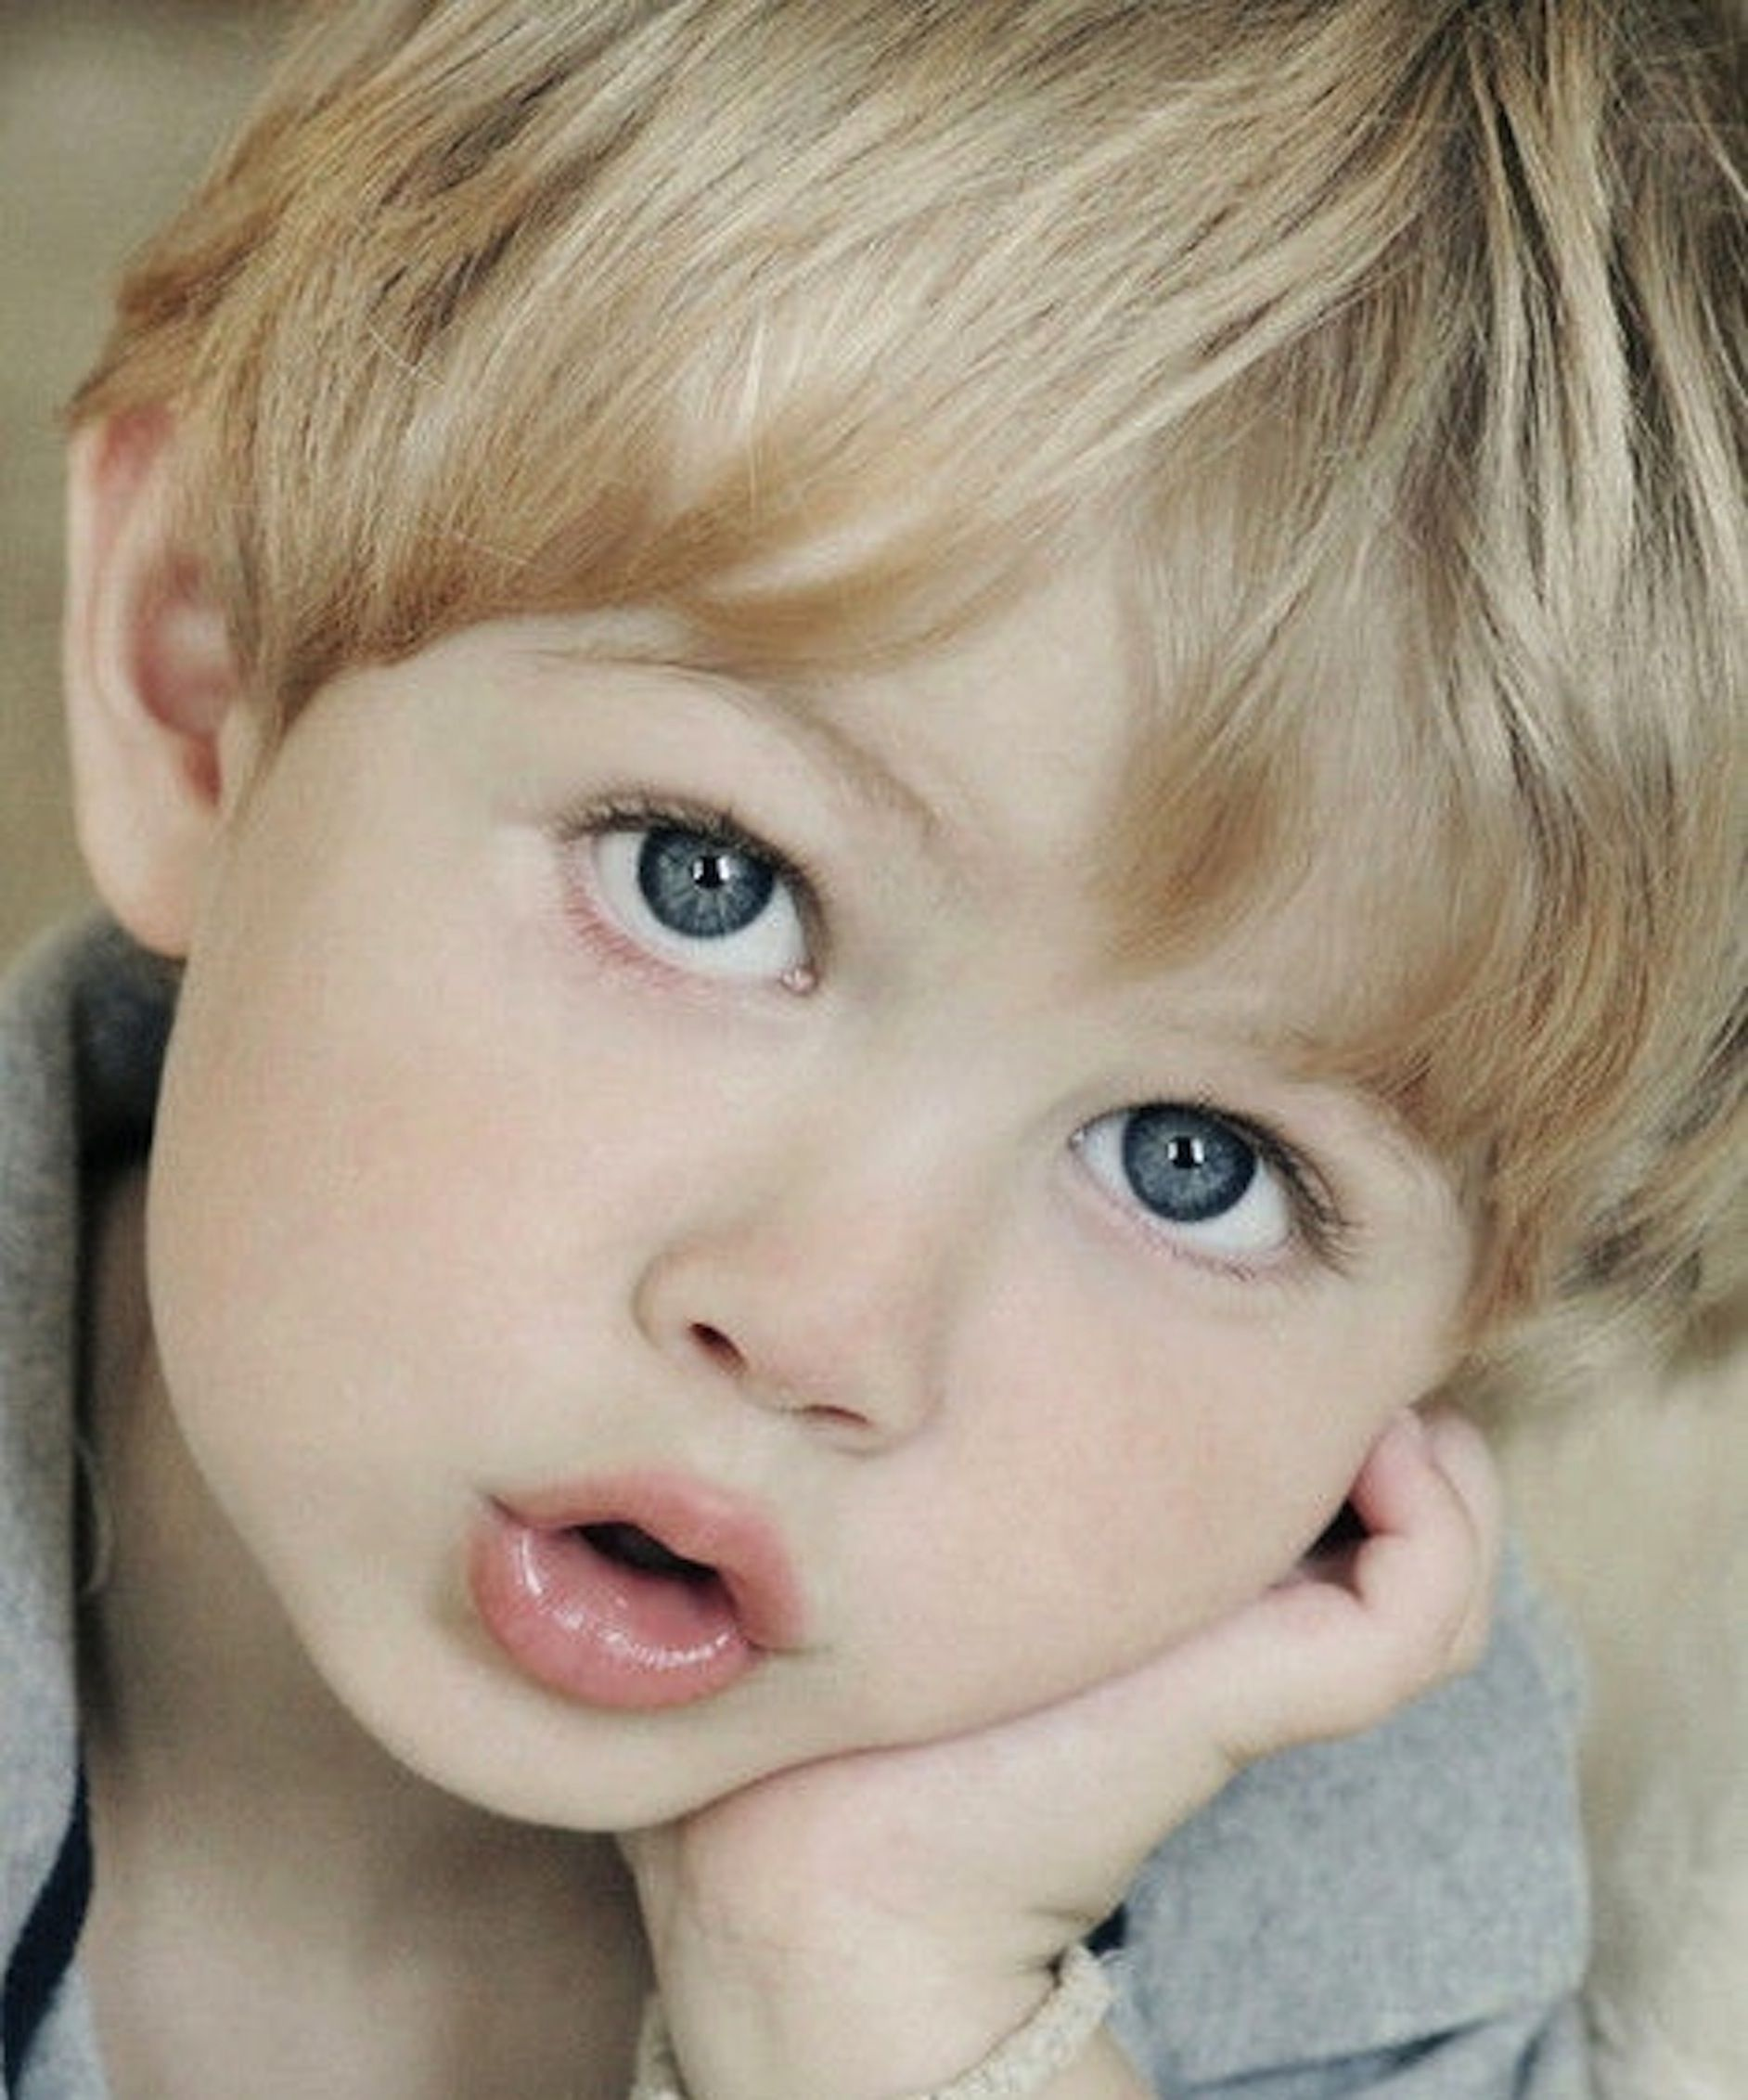 's sweet little boy with blonde